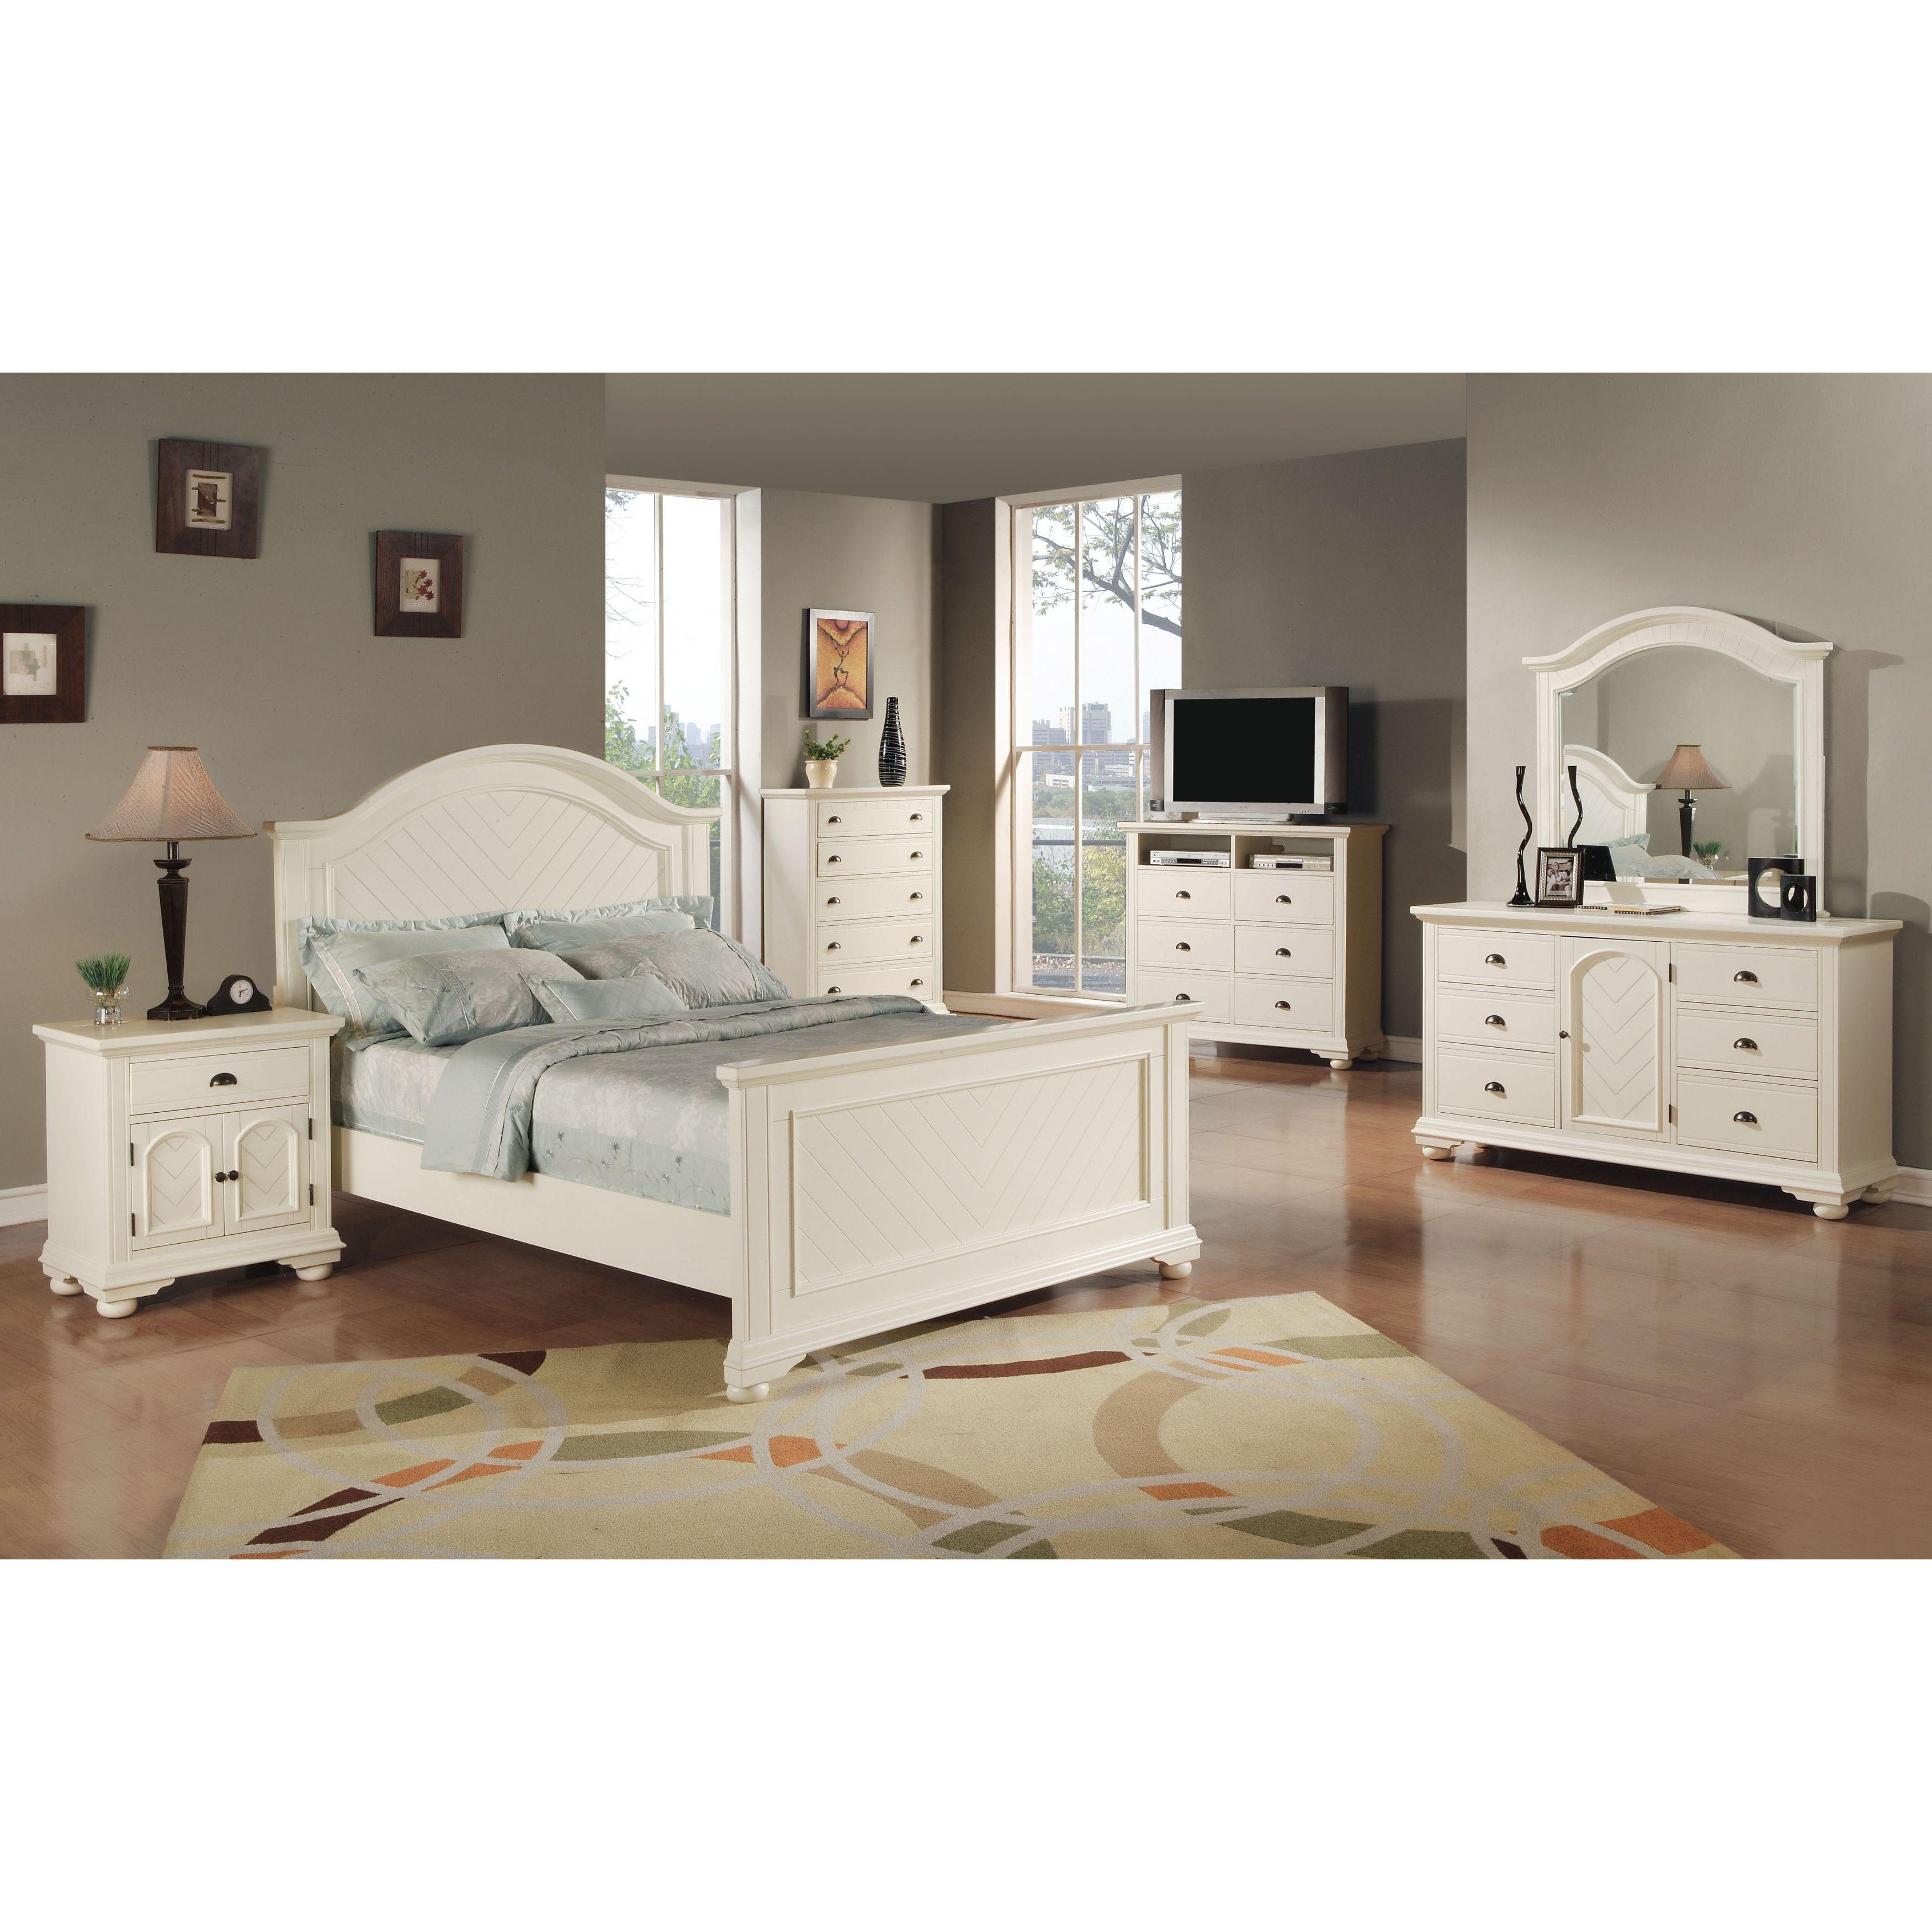 Picket House Furnishings Addison White King Panel 5PC Bedroom Set